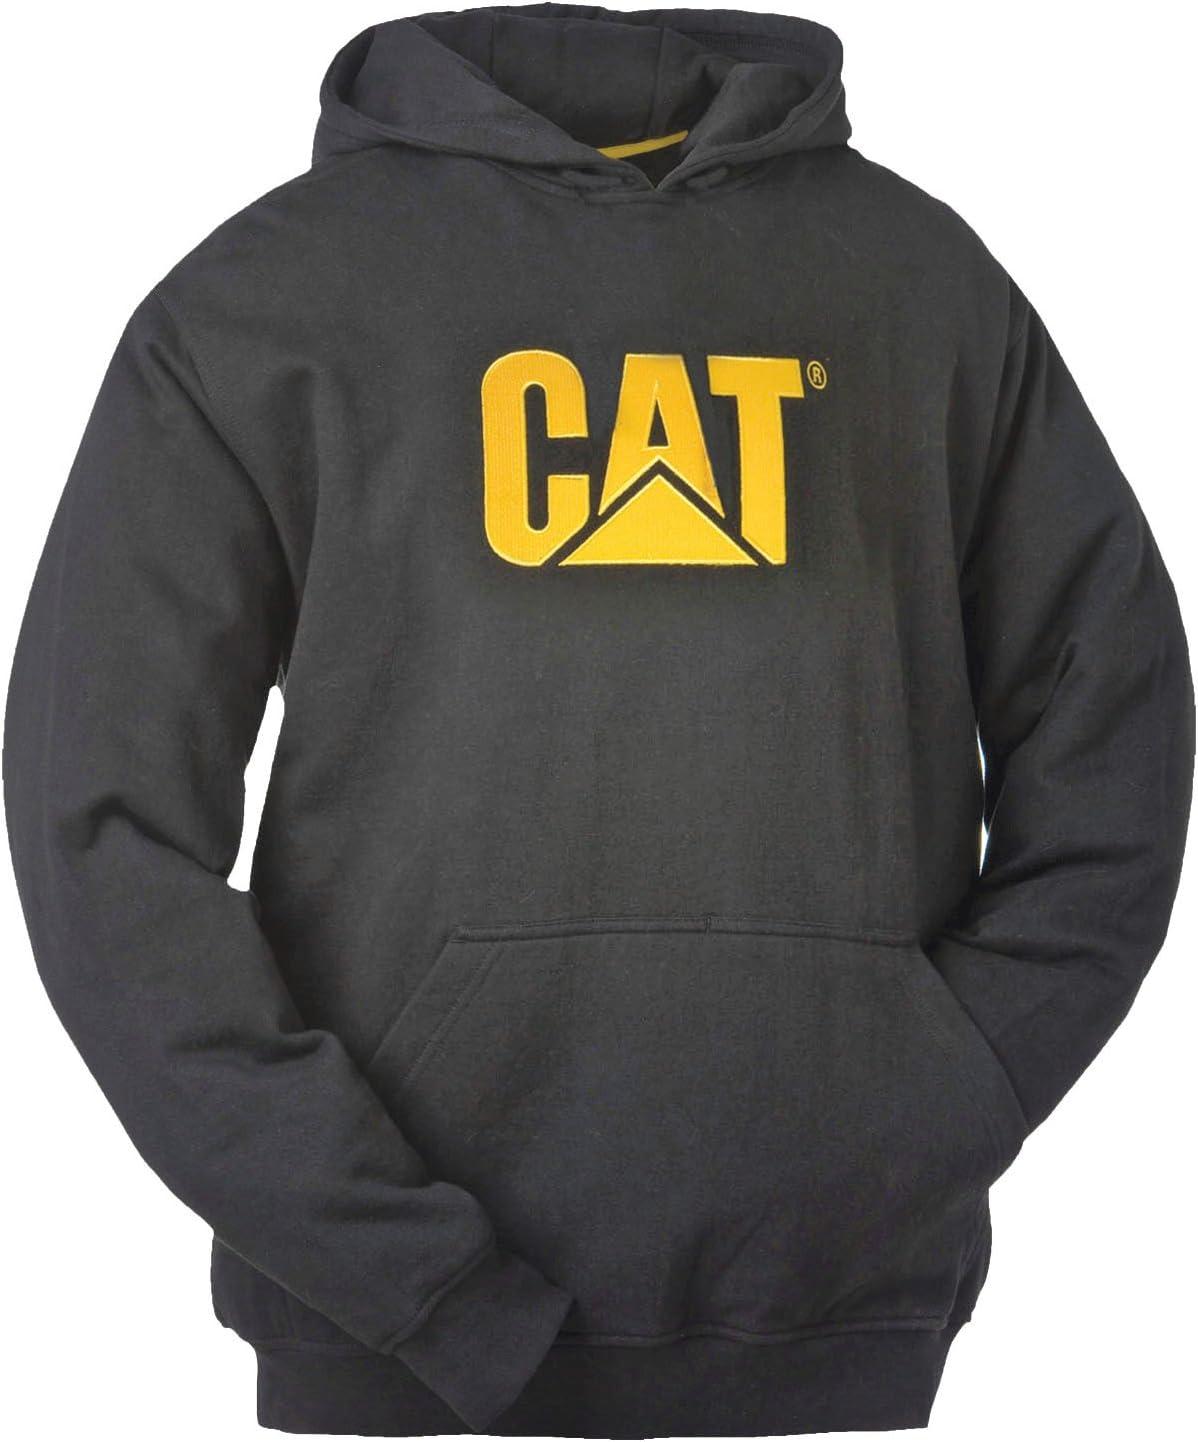 TALLA XXL. Caterpillar CAT Sudadera con capucha W10646-016-L negro Negro xx-large